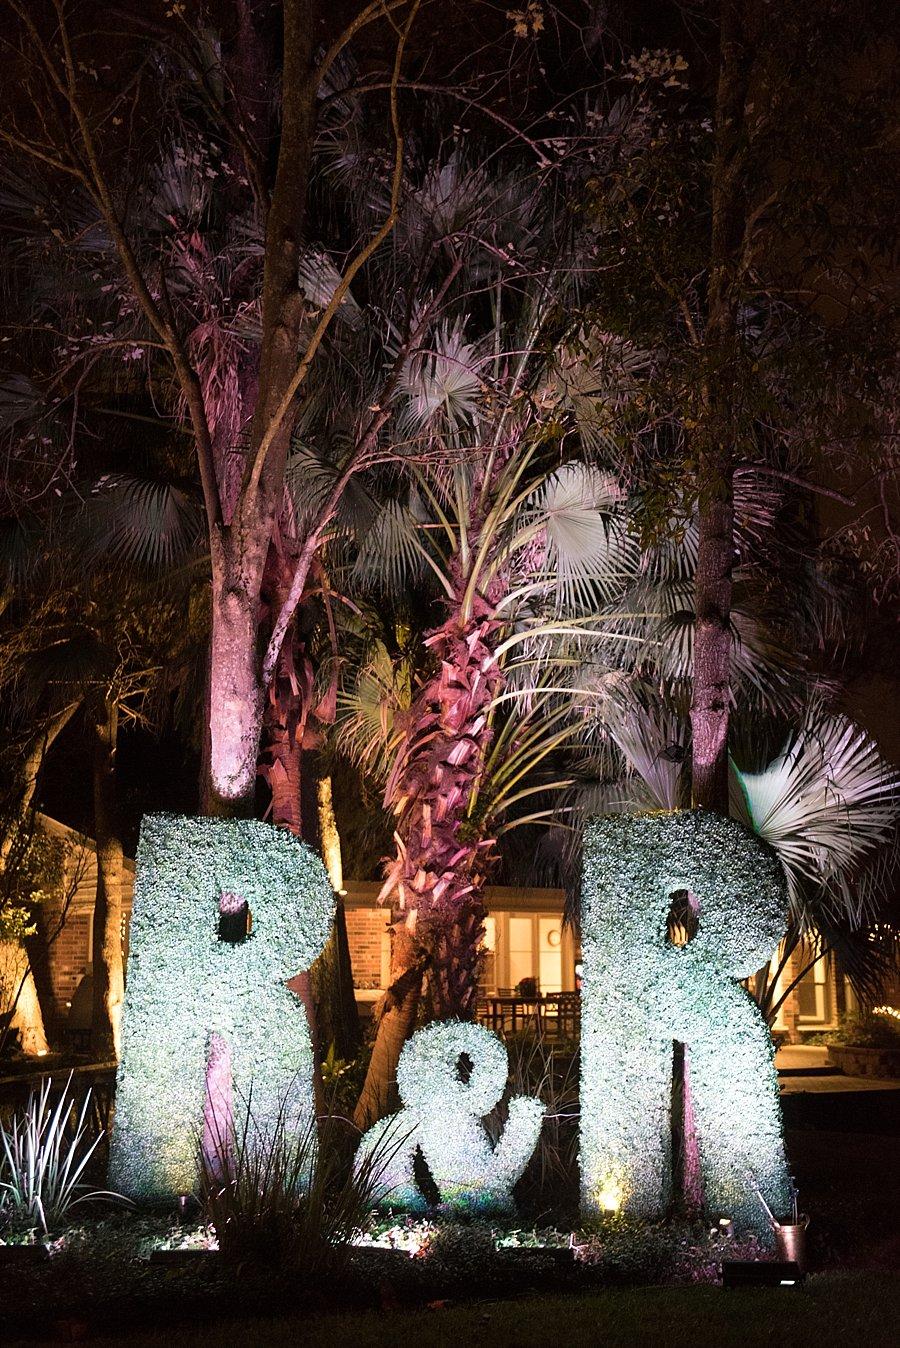 Boxwood Monogram | Classic black and white black-tie wedding at home | Sapphire Events | Jacqueline Dallimore Photo | NYE Wedding | Estate Wedding | Tented Wedding | Monique Lhuillier gown | Blush Wedding dress | New Year's Eve wedding